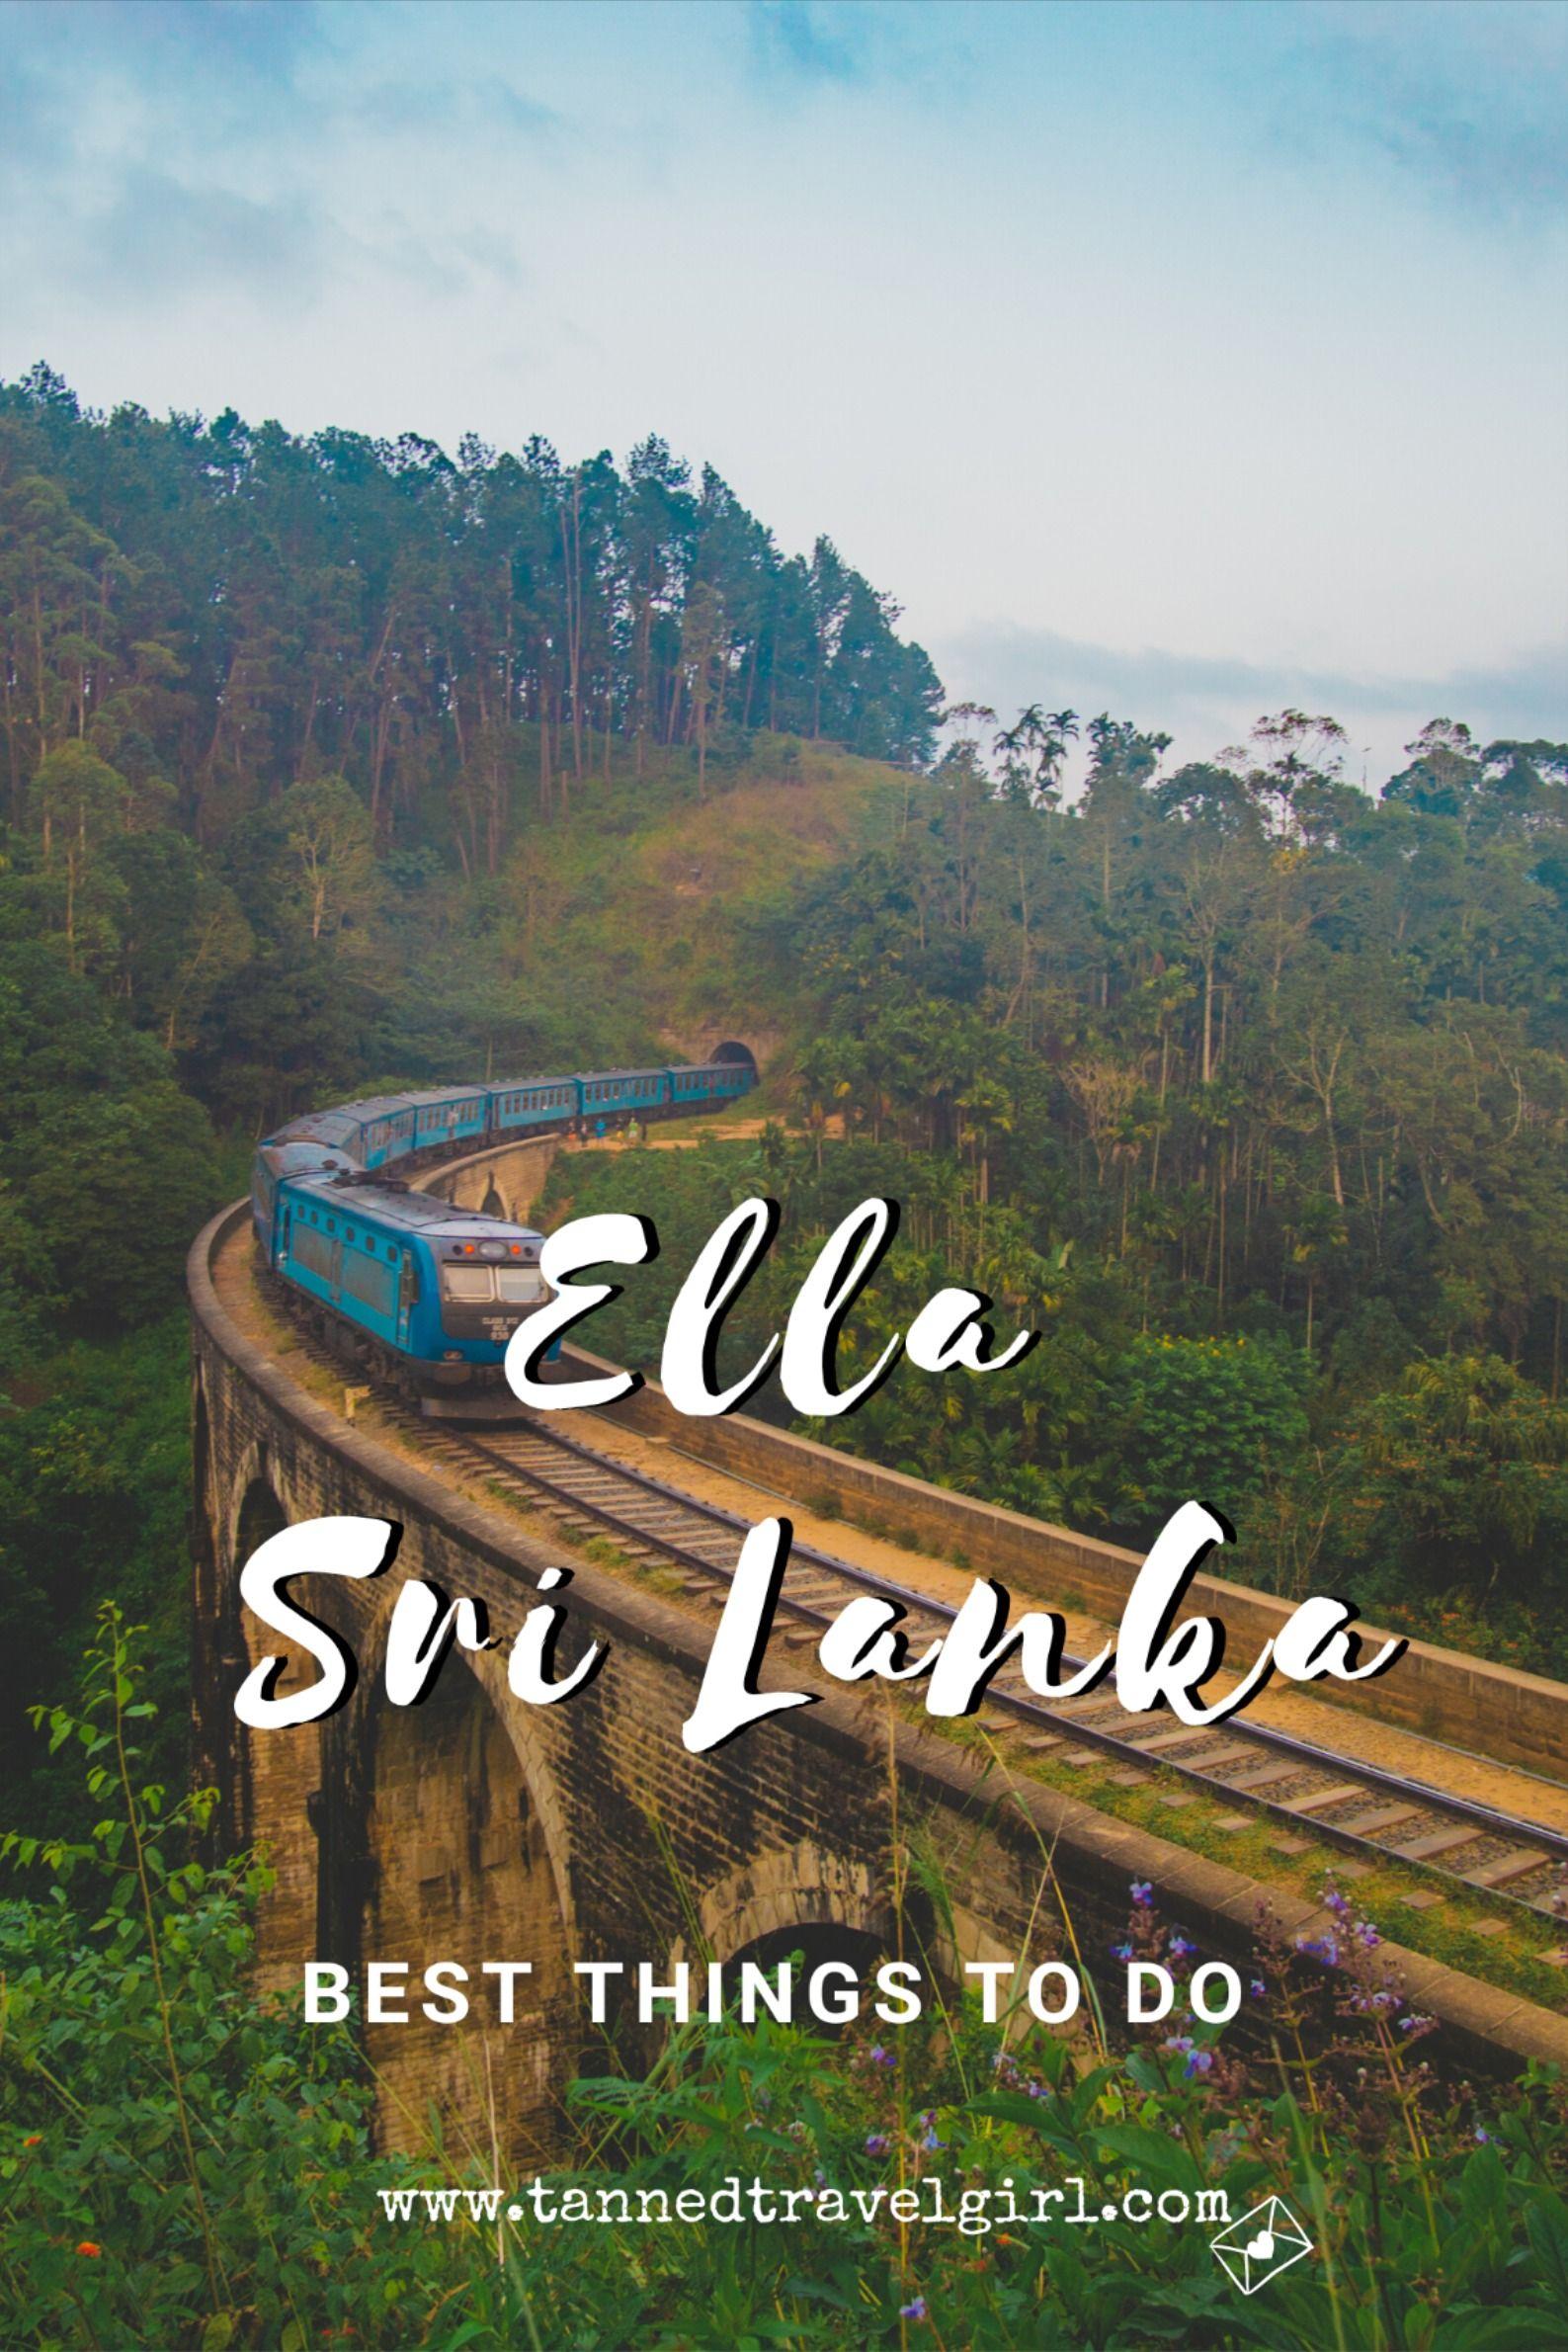 10 Best Things To Do In Ella Sri Lanka Sri Lanka Travel Guide Tan Travel Vacation Trips Bhutan Travel